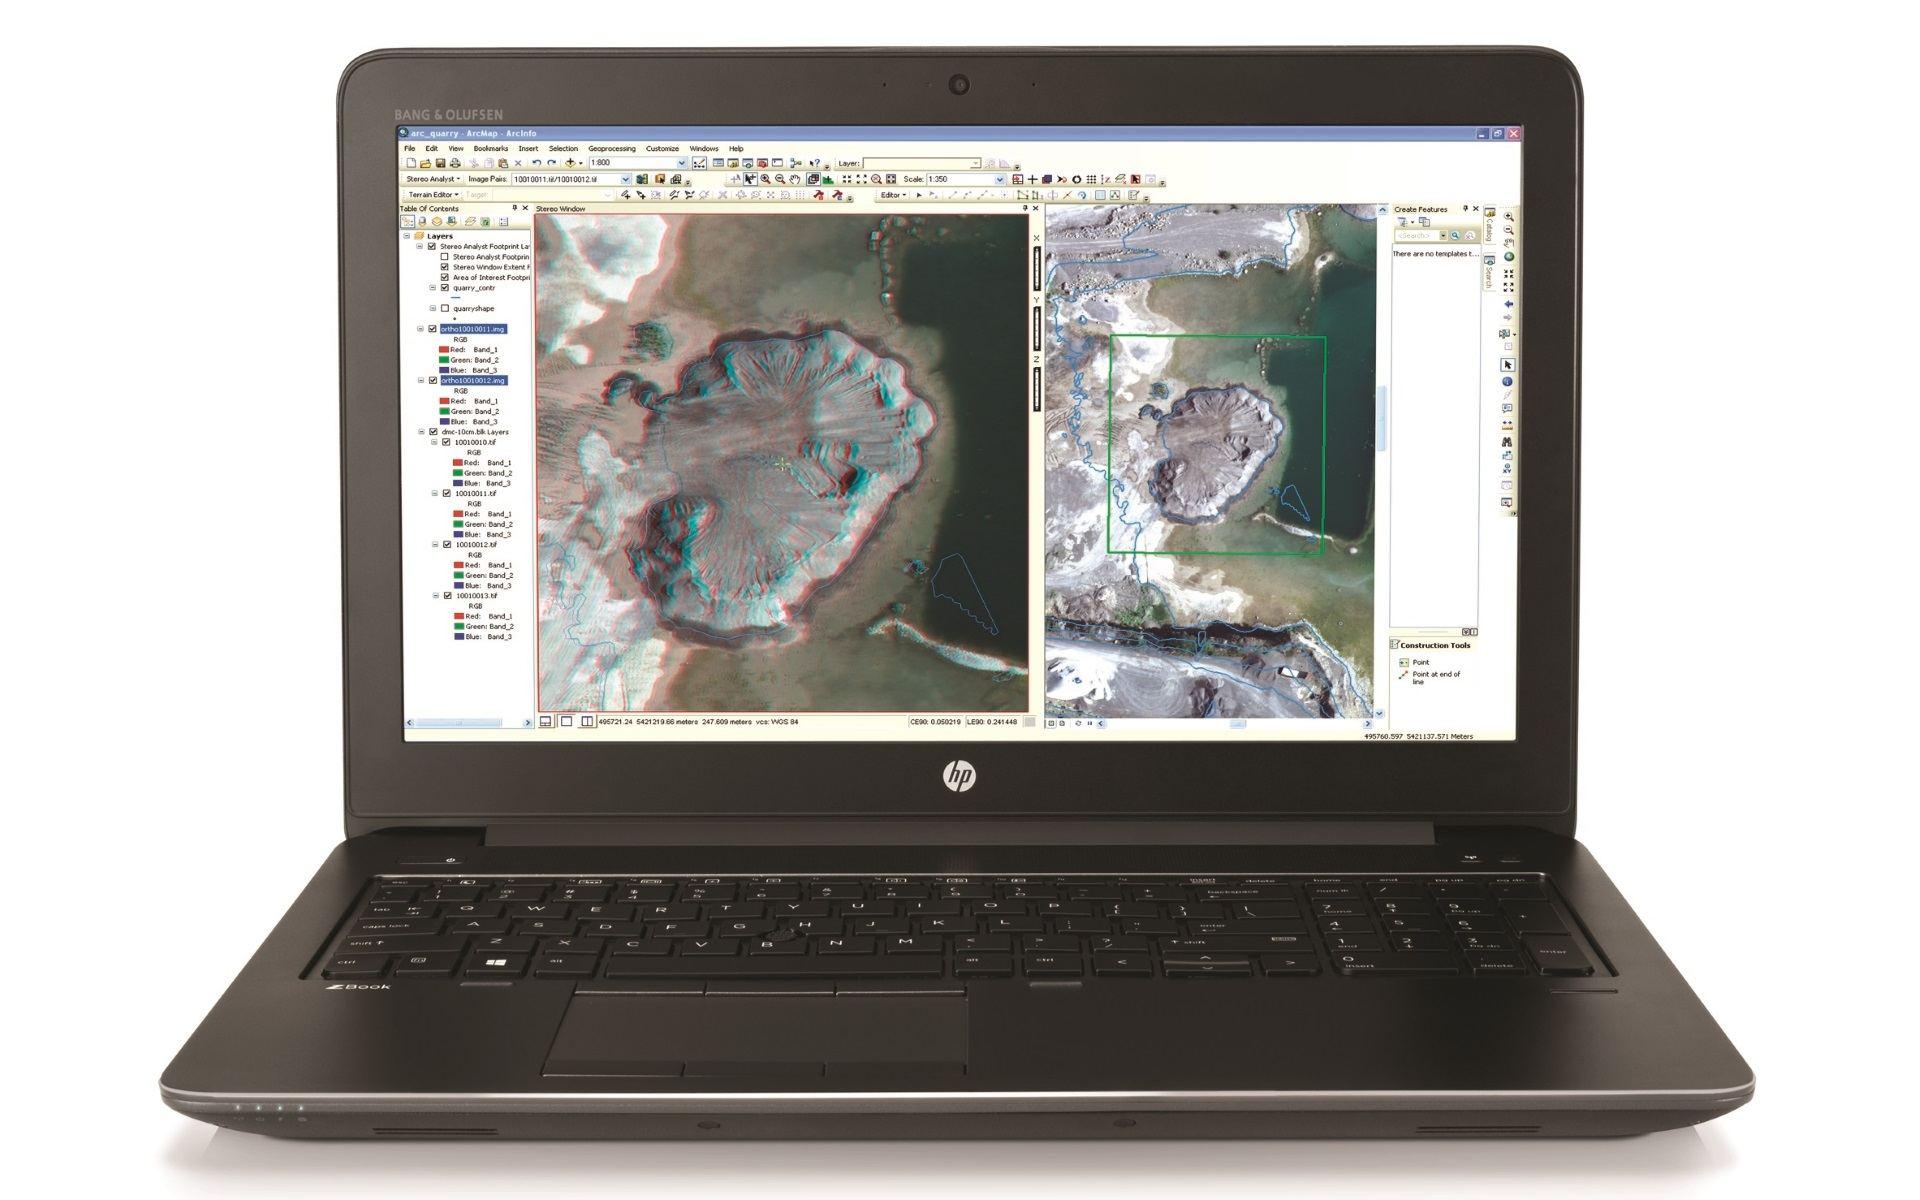 HP ZBook 15 G3 FHD/i7-6700HQ/8GB/256SSD/NVIDIA M2000/VGA/HDMI/TB/RJ45/WFI/BT/MCR/FPR/3RServis/7+W10P